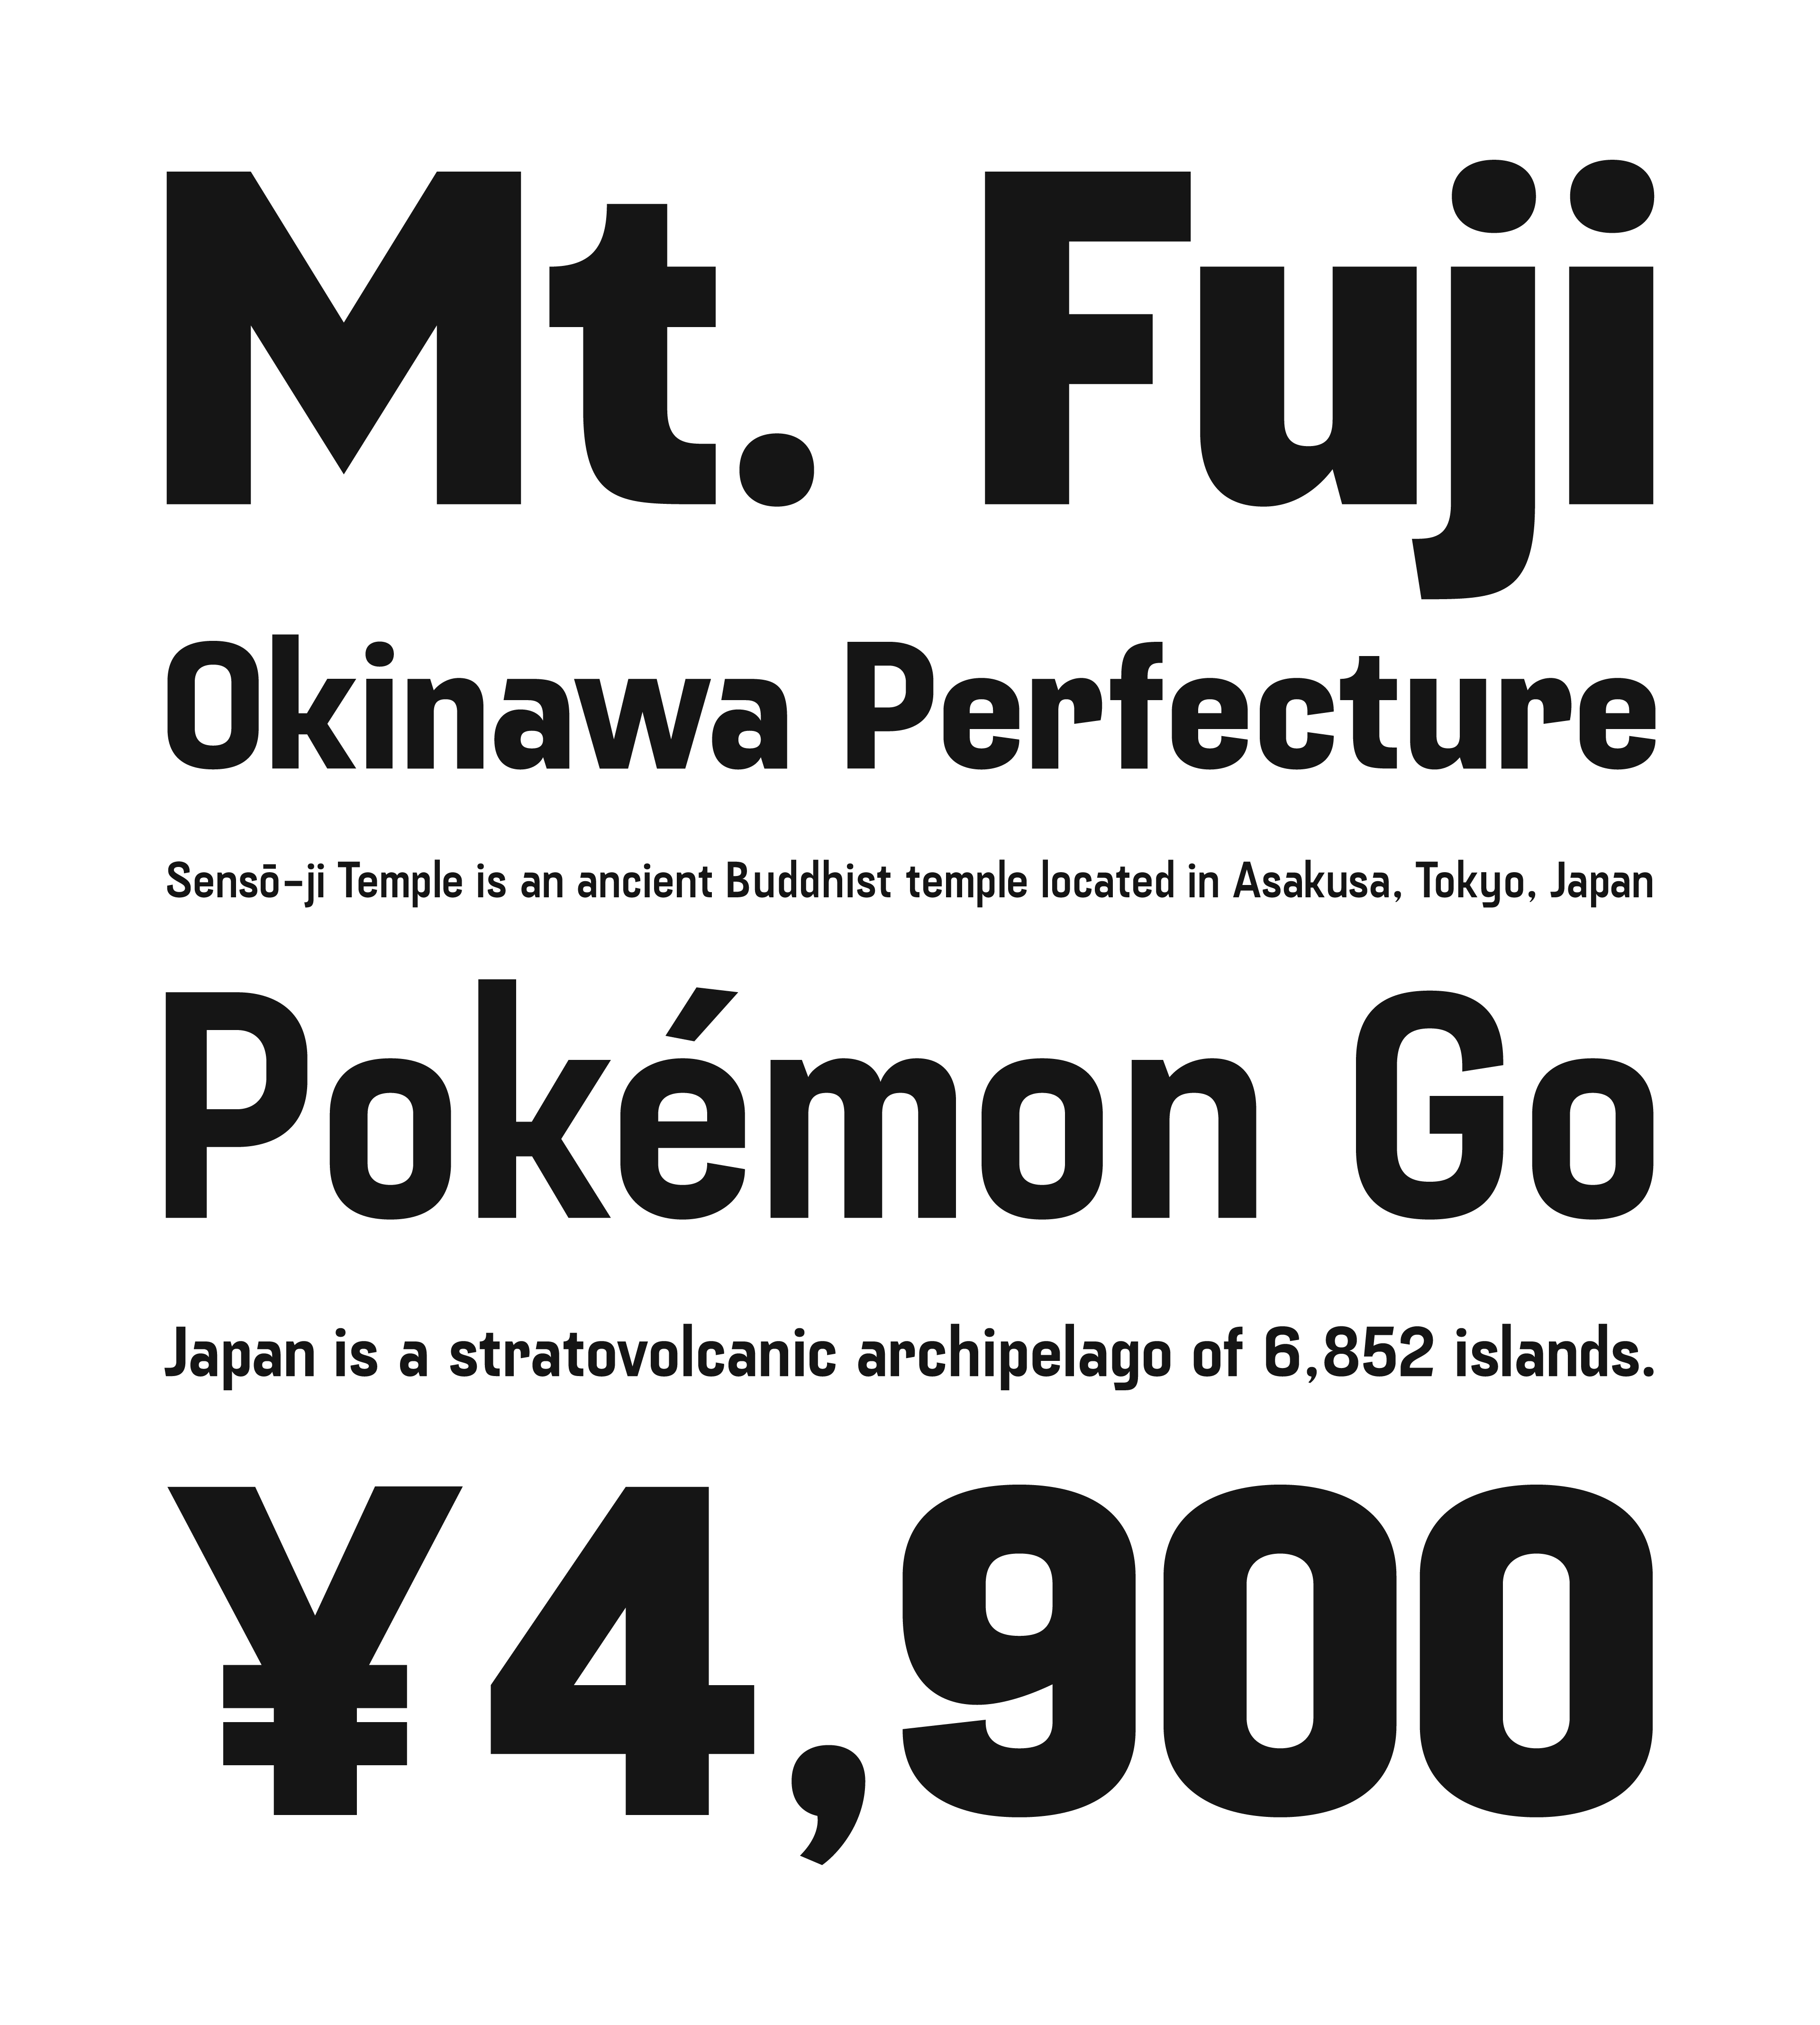 Fuji Sans Full Family (4 Styles) / Desktop / 1 Computer